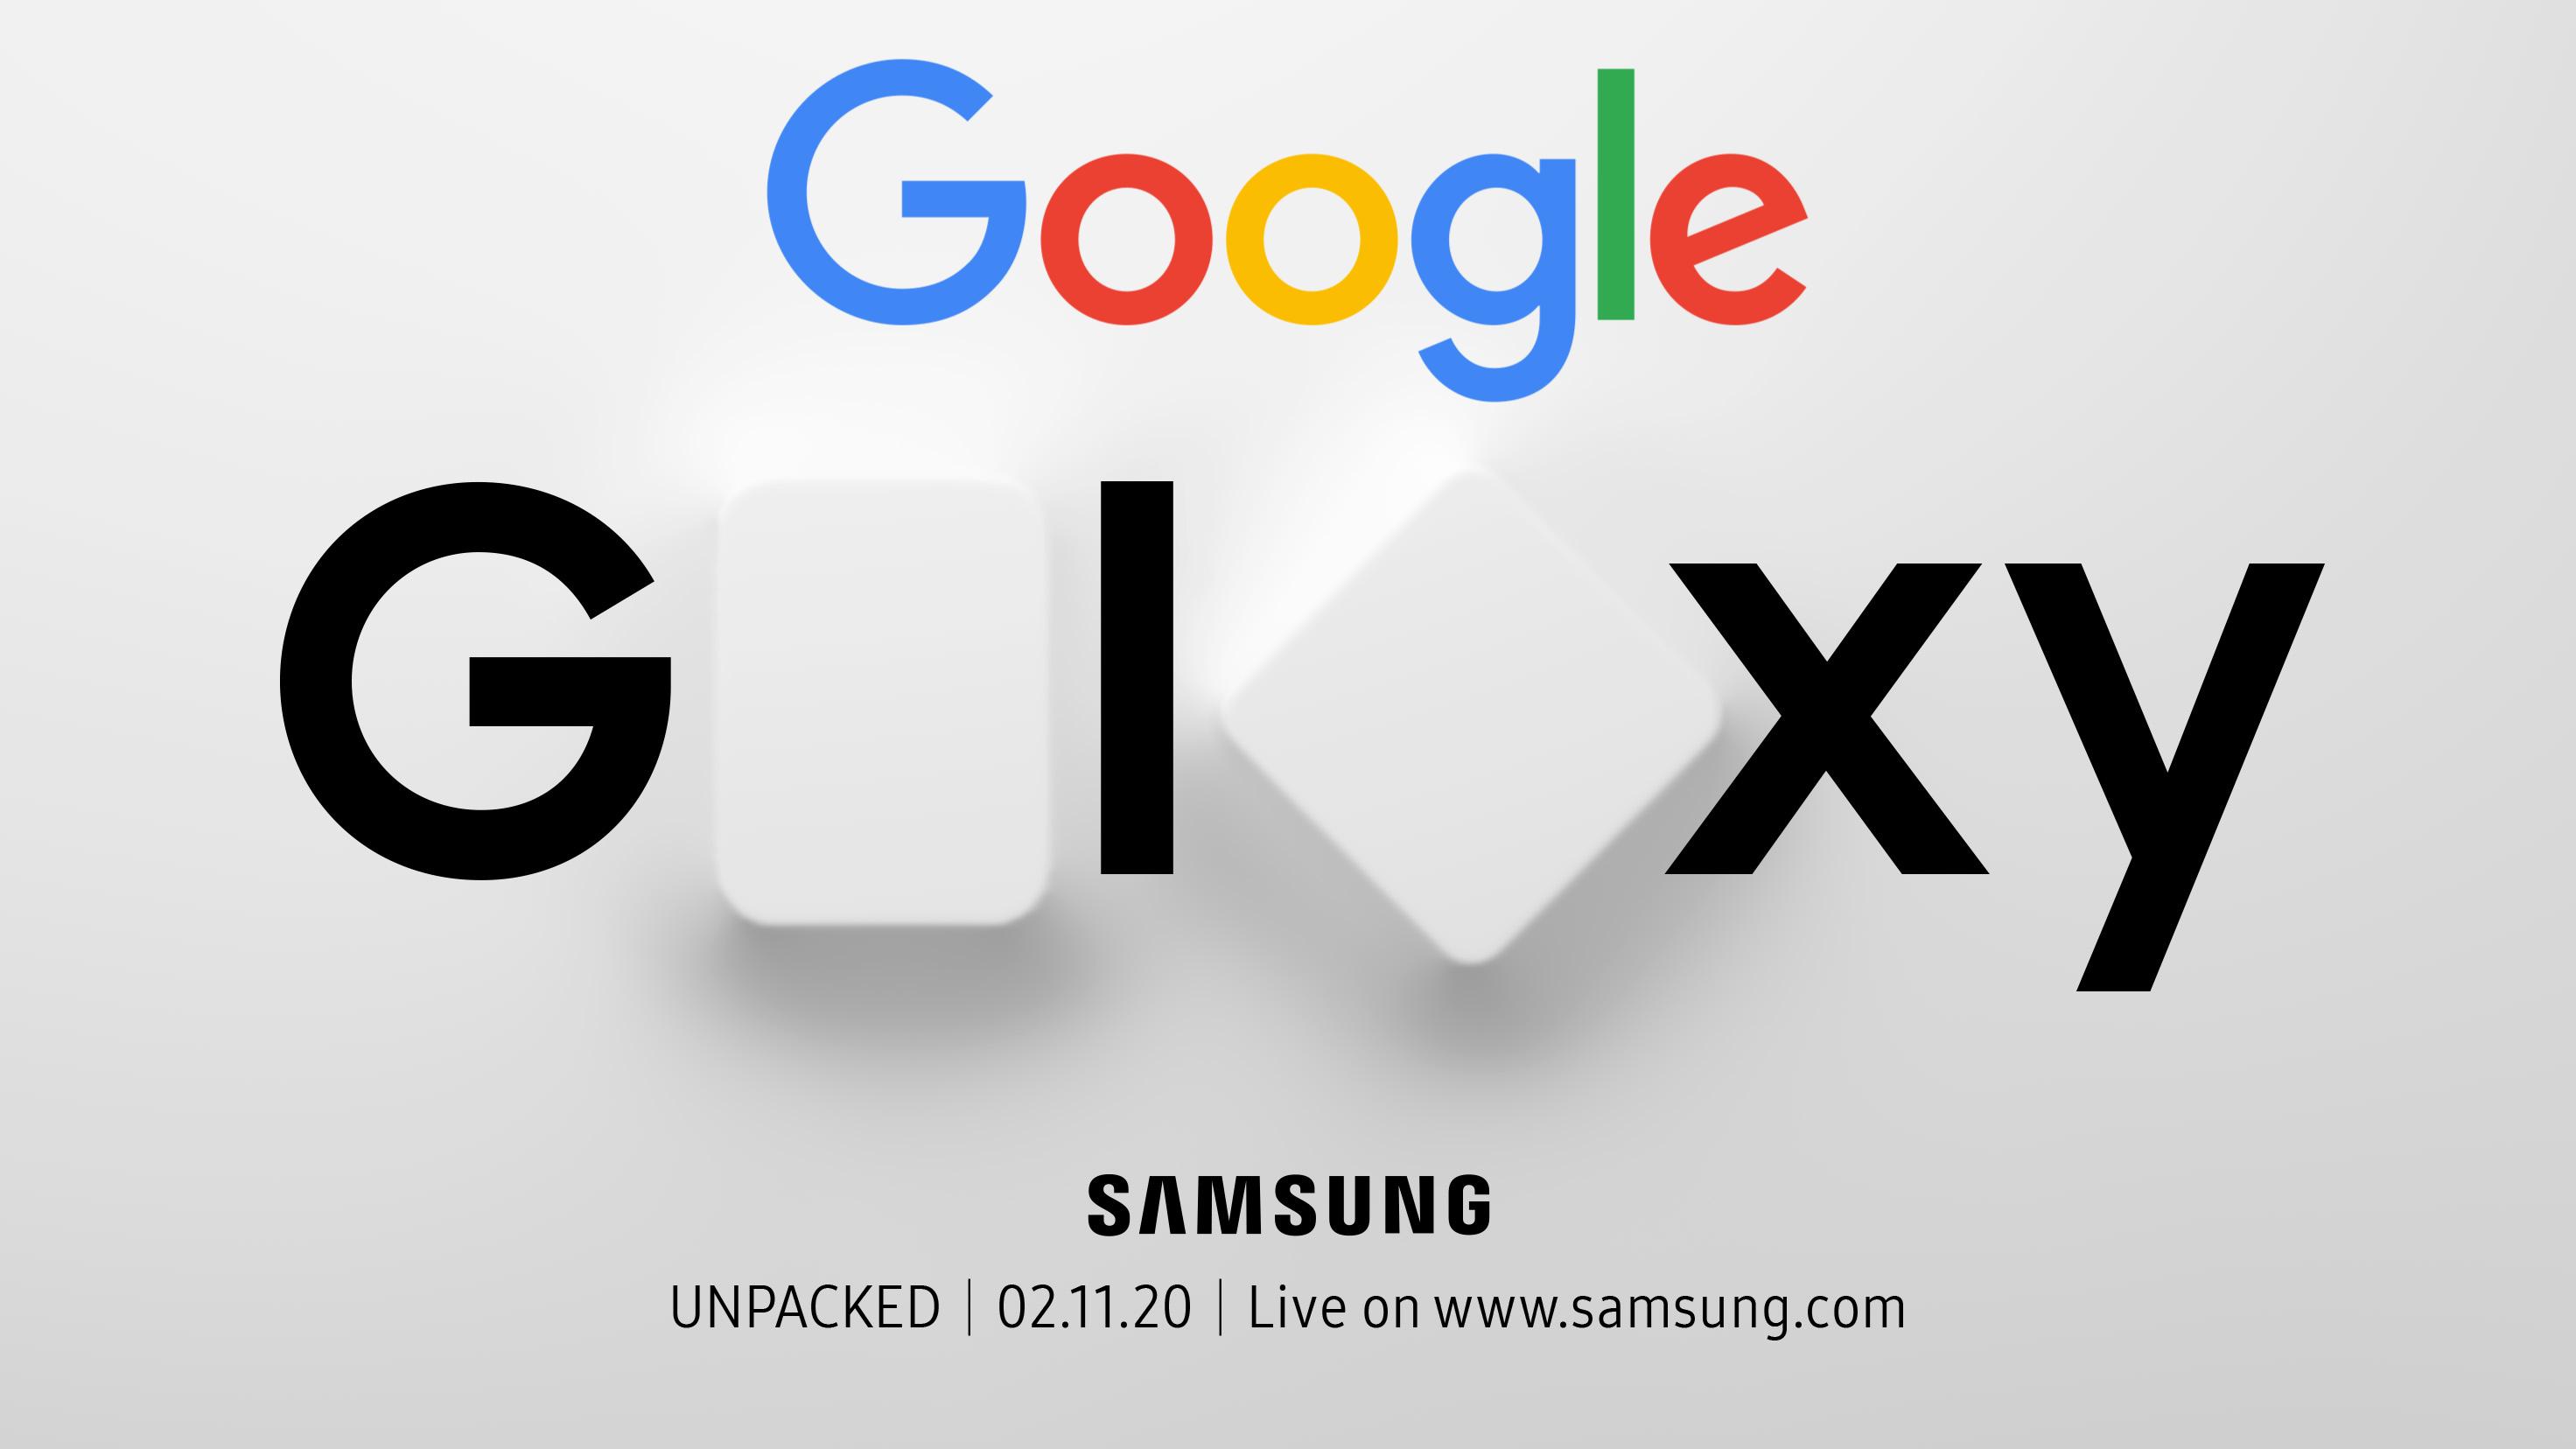 Galaxy Unpacked Google